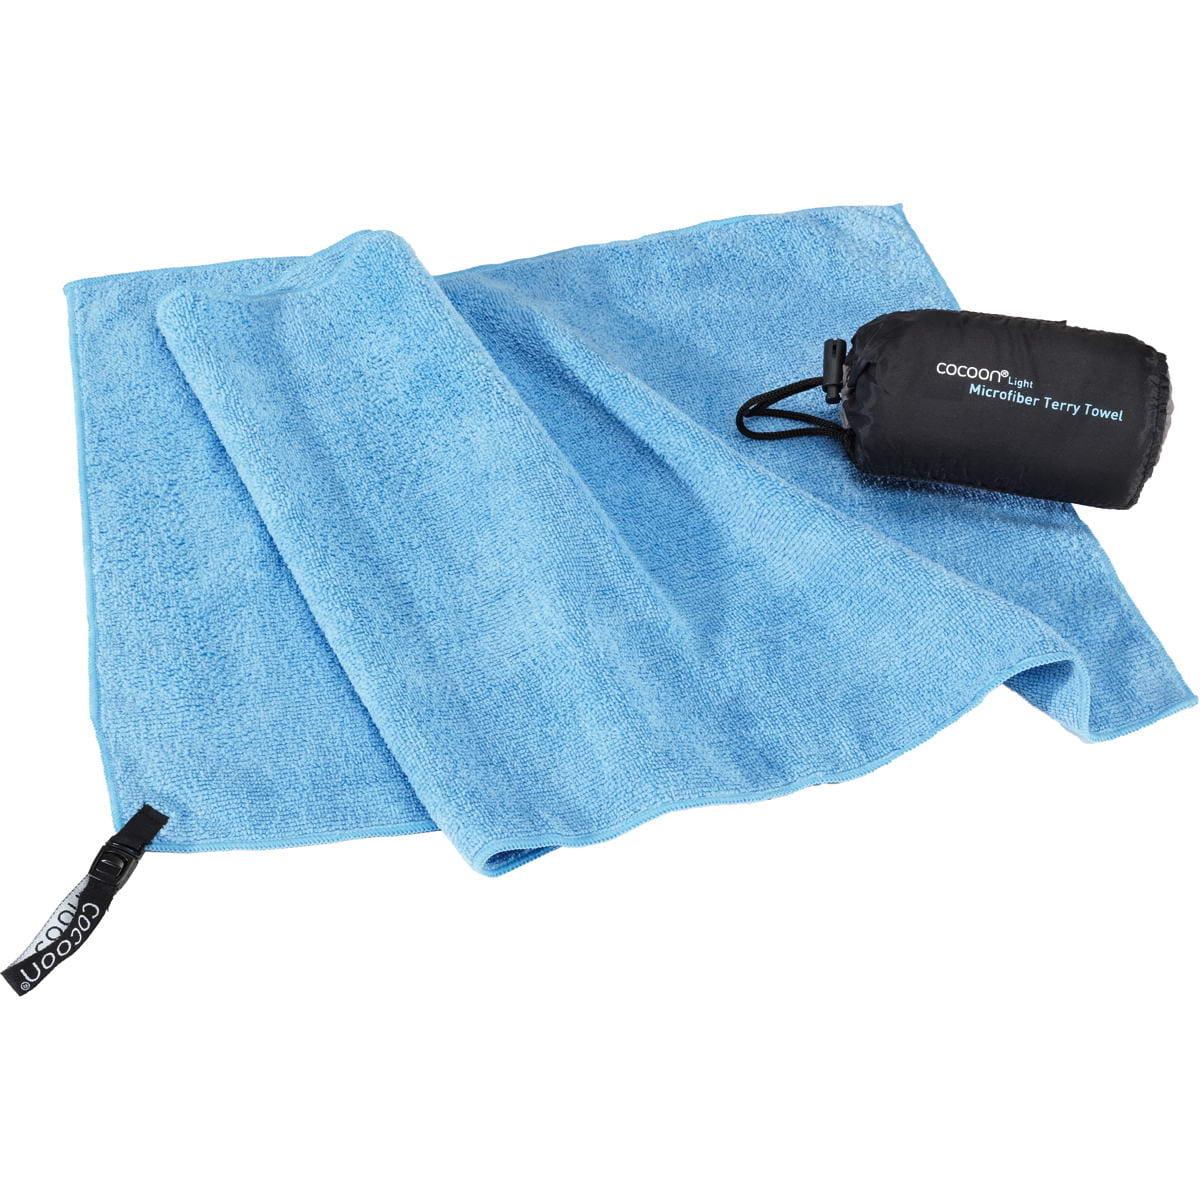 COCOON Terry Towel Light Gr. S - Wander-Handtuch lightblue - Bild 1